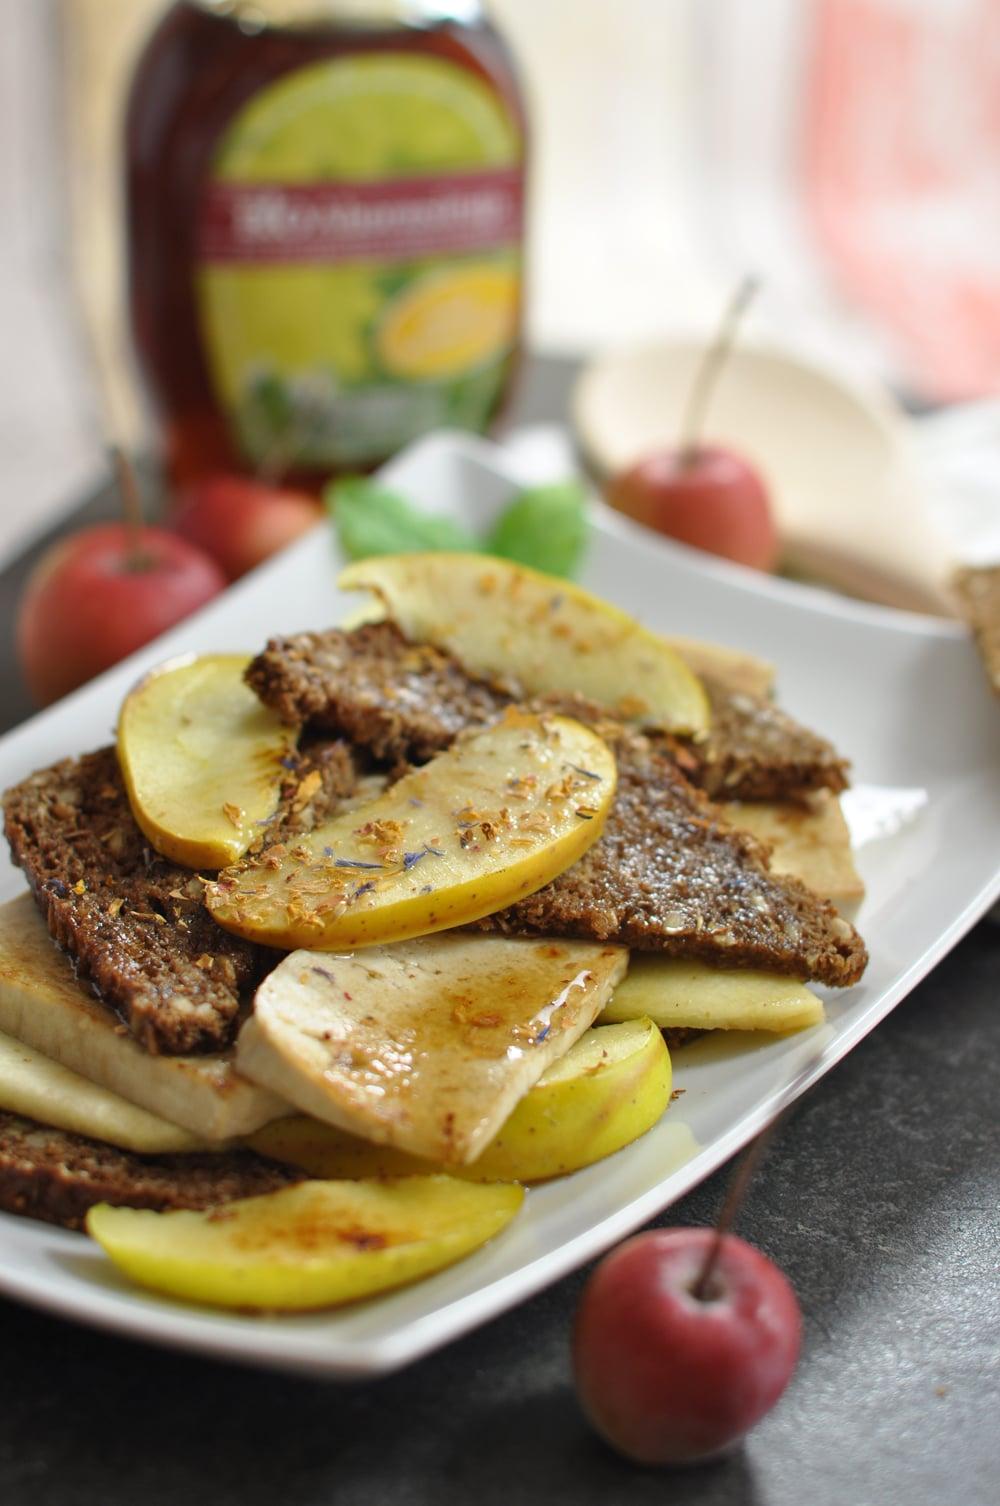 Apfel-Tofu-Frühstück - mit Schwung in den Tag! - apfel tofu6 - 12